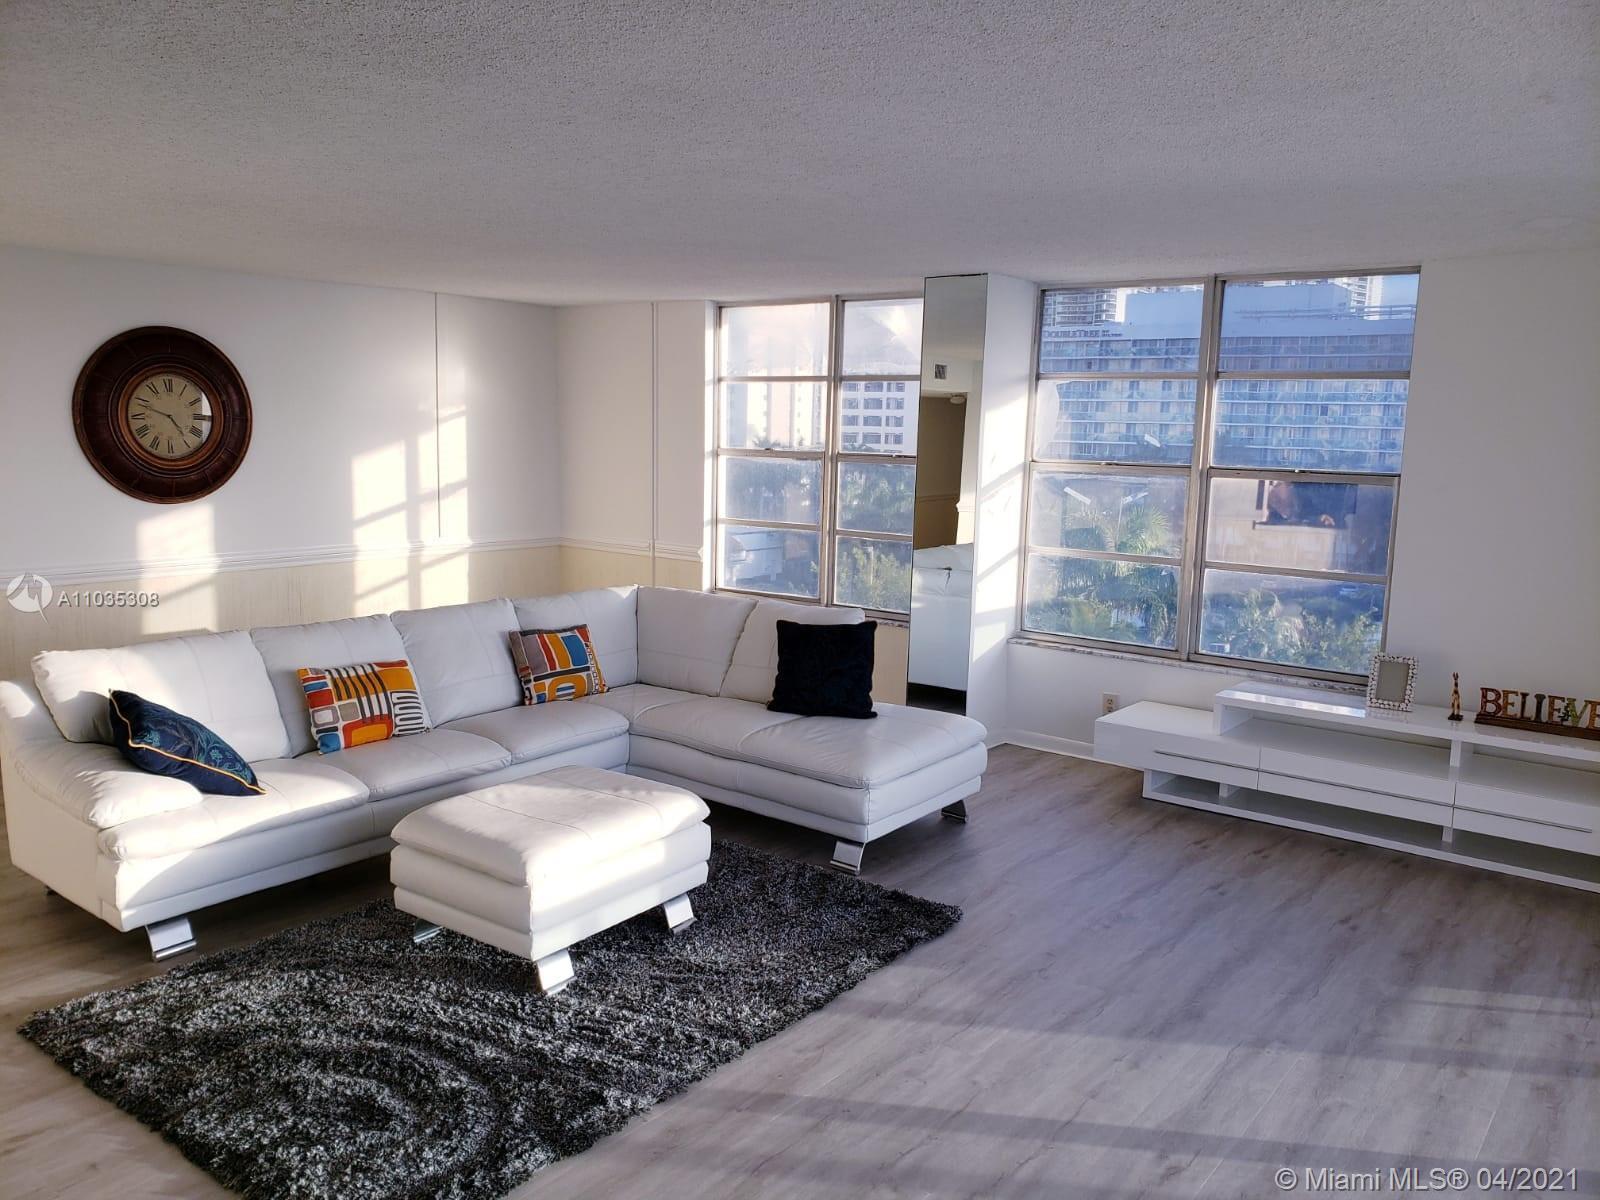 BREATHTAKING VIEWS, BEST line in Hallmark! 2 bedrooms 2 baths HUGE CORNER unit with beautiful views